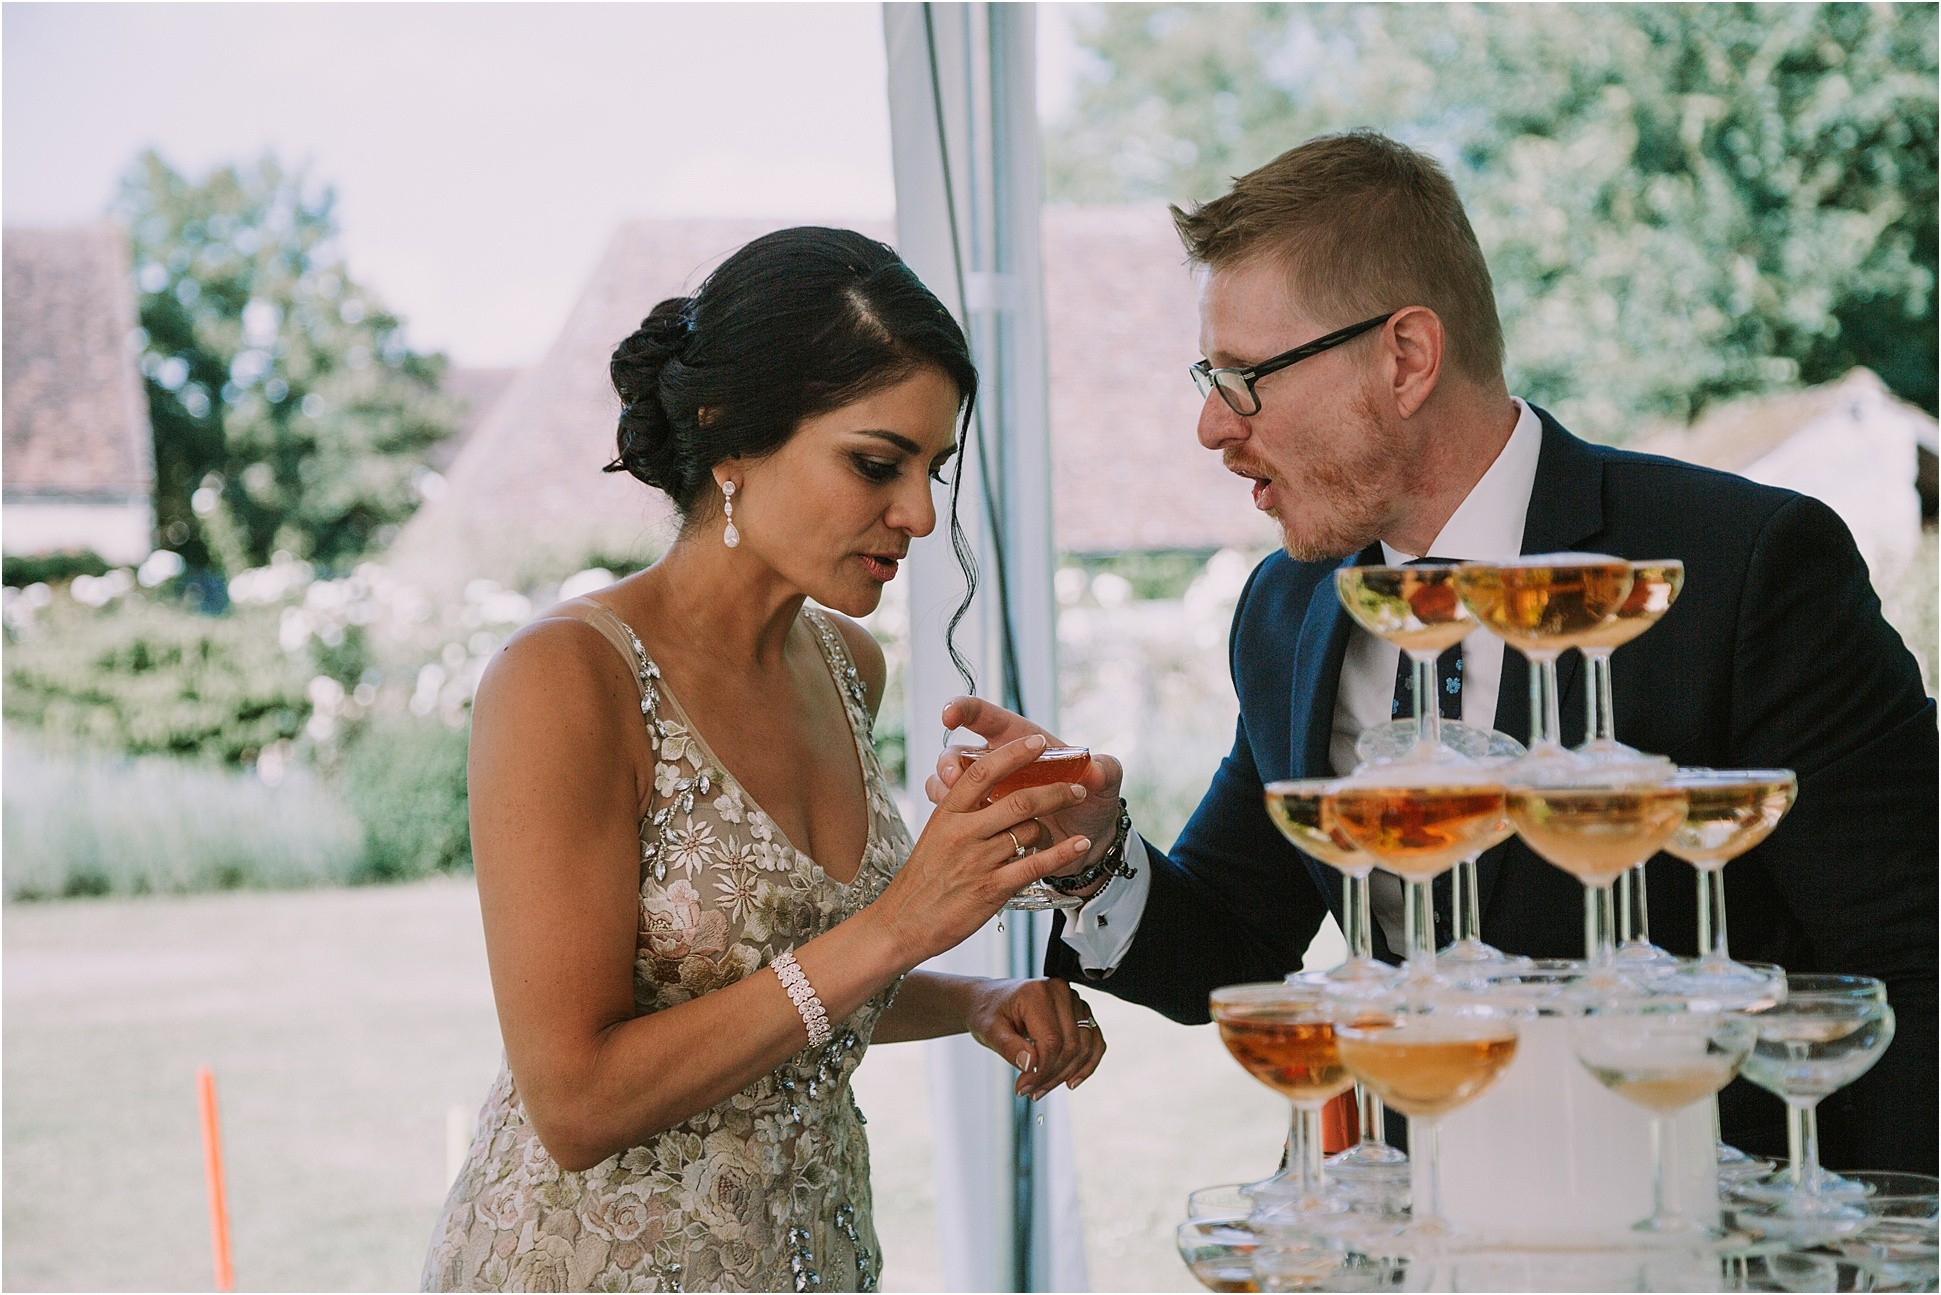 Kateryna-photos-photographe-mariage-chateau-st-paterne-mayenne-normandie_0140.jpg